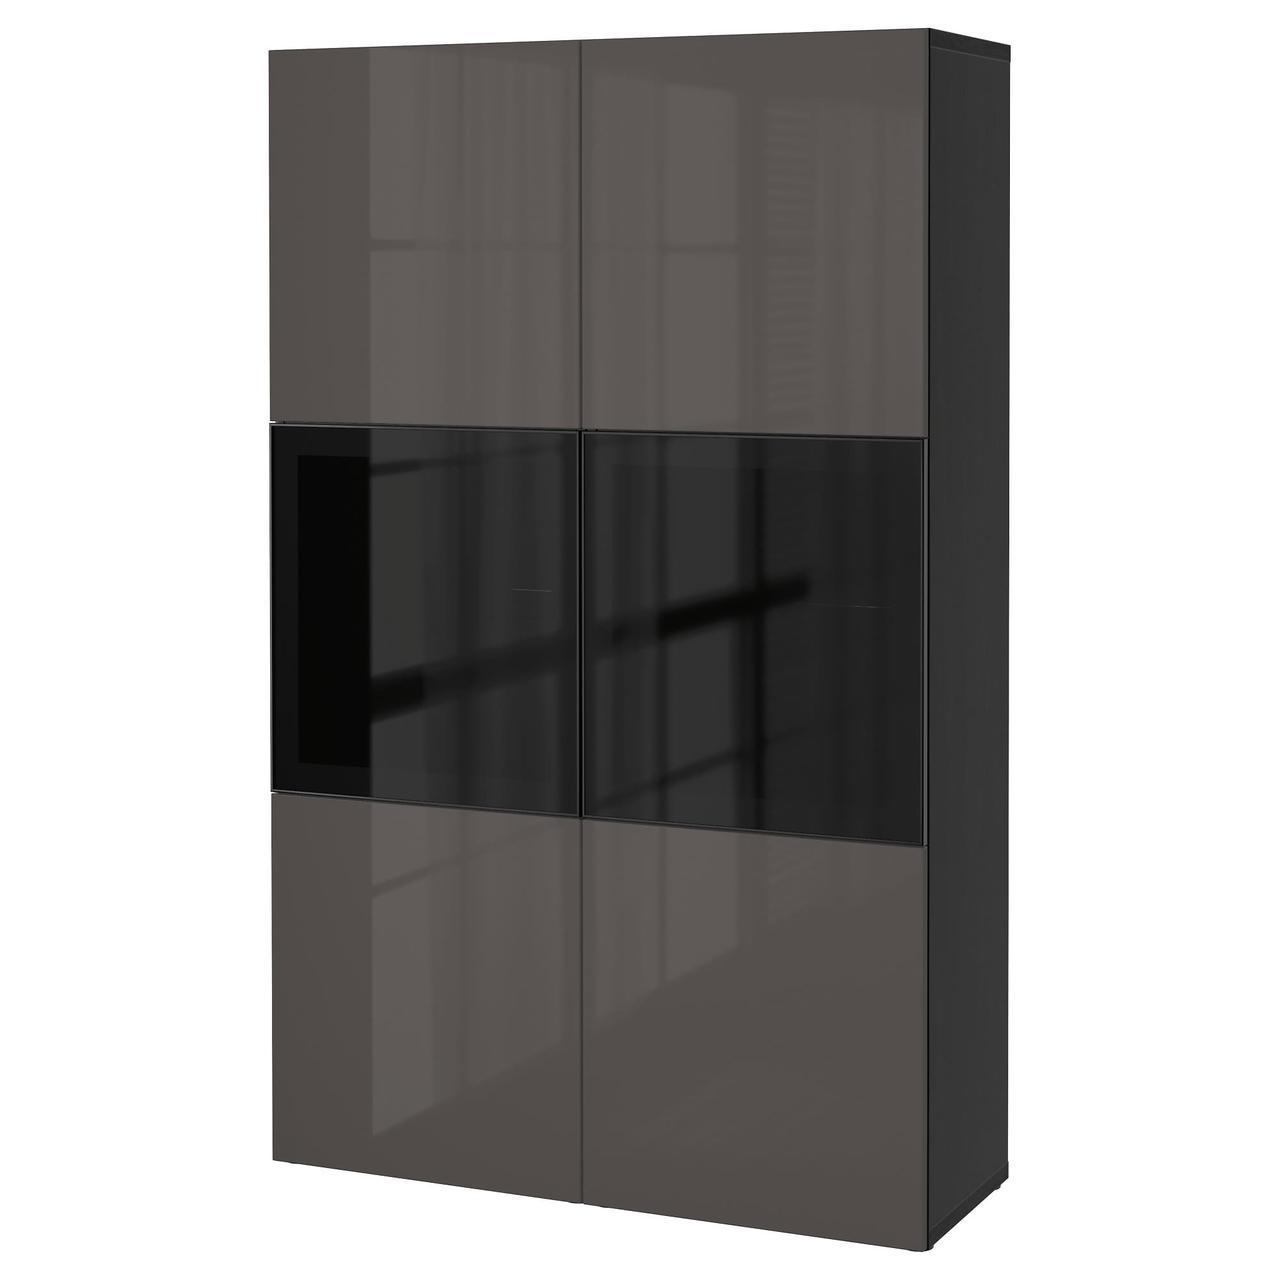 Сервант IKEA BESTÅ 120x40x192 см Selsviken серый черно-коричневый 390.897.89